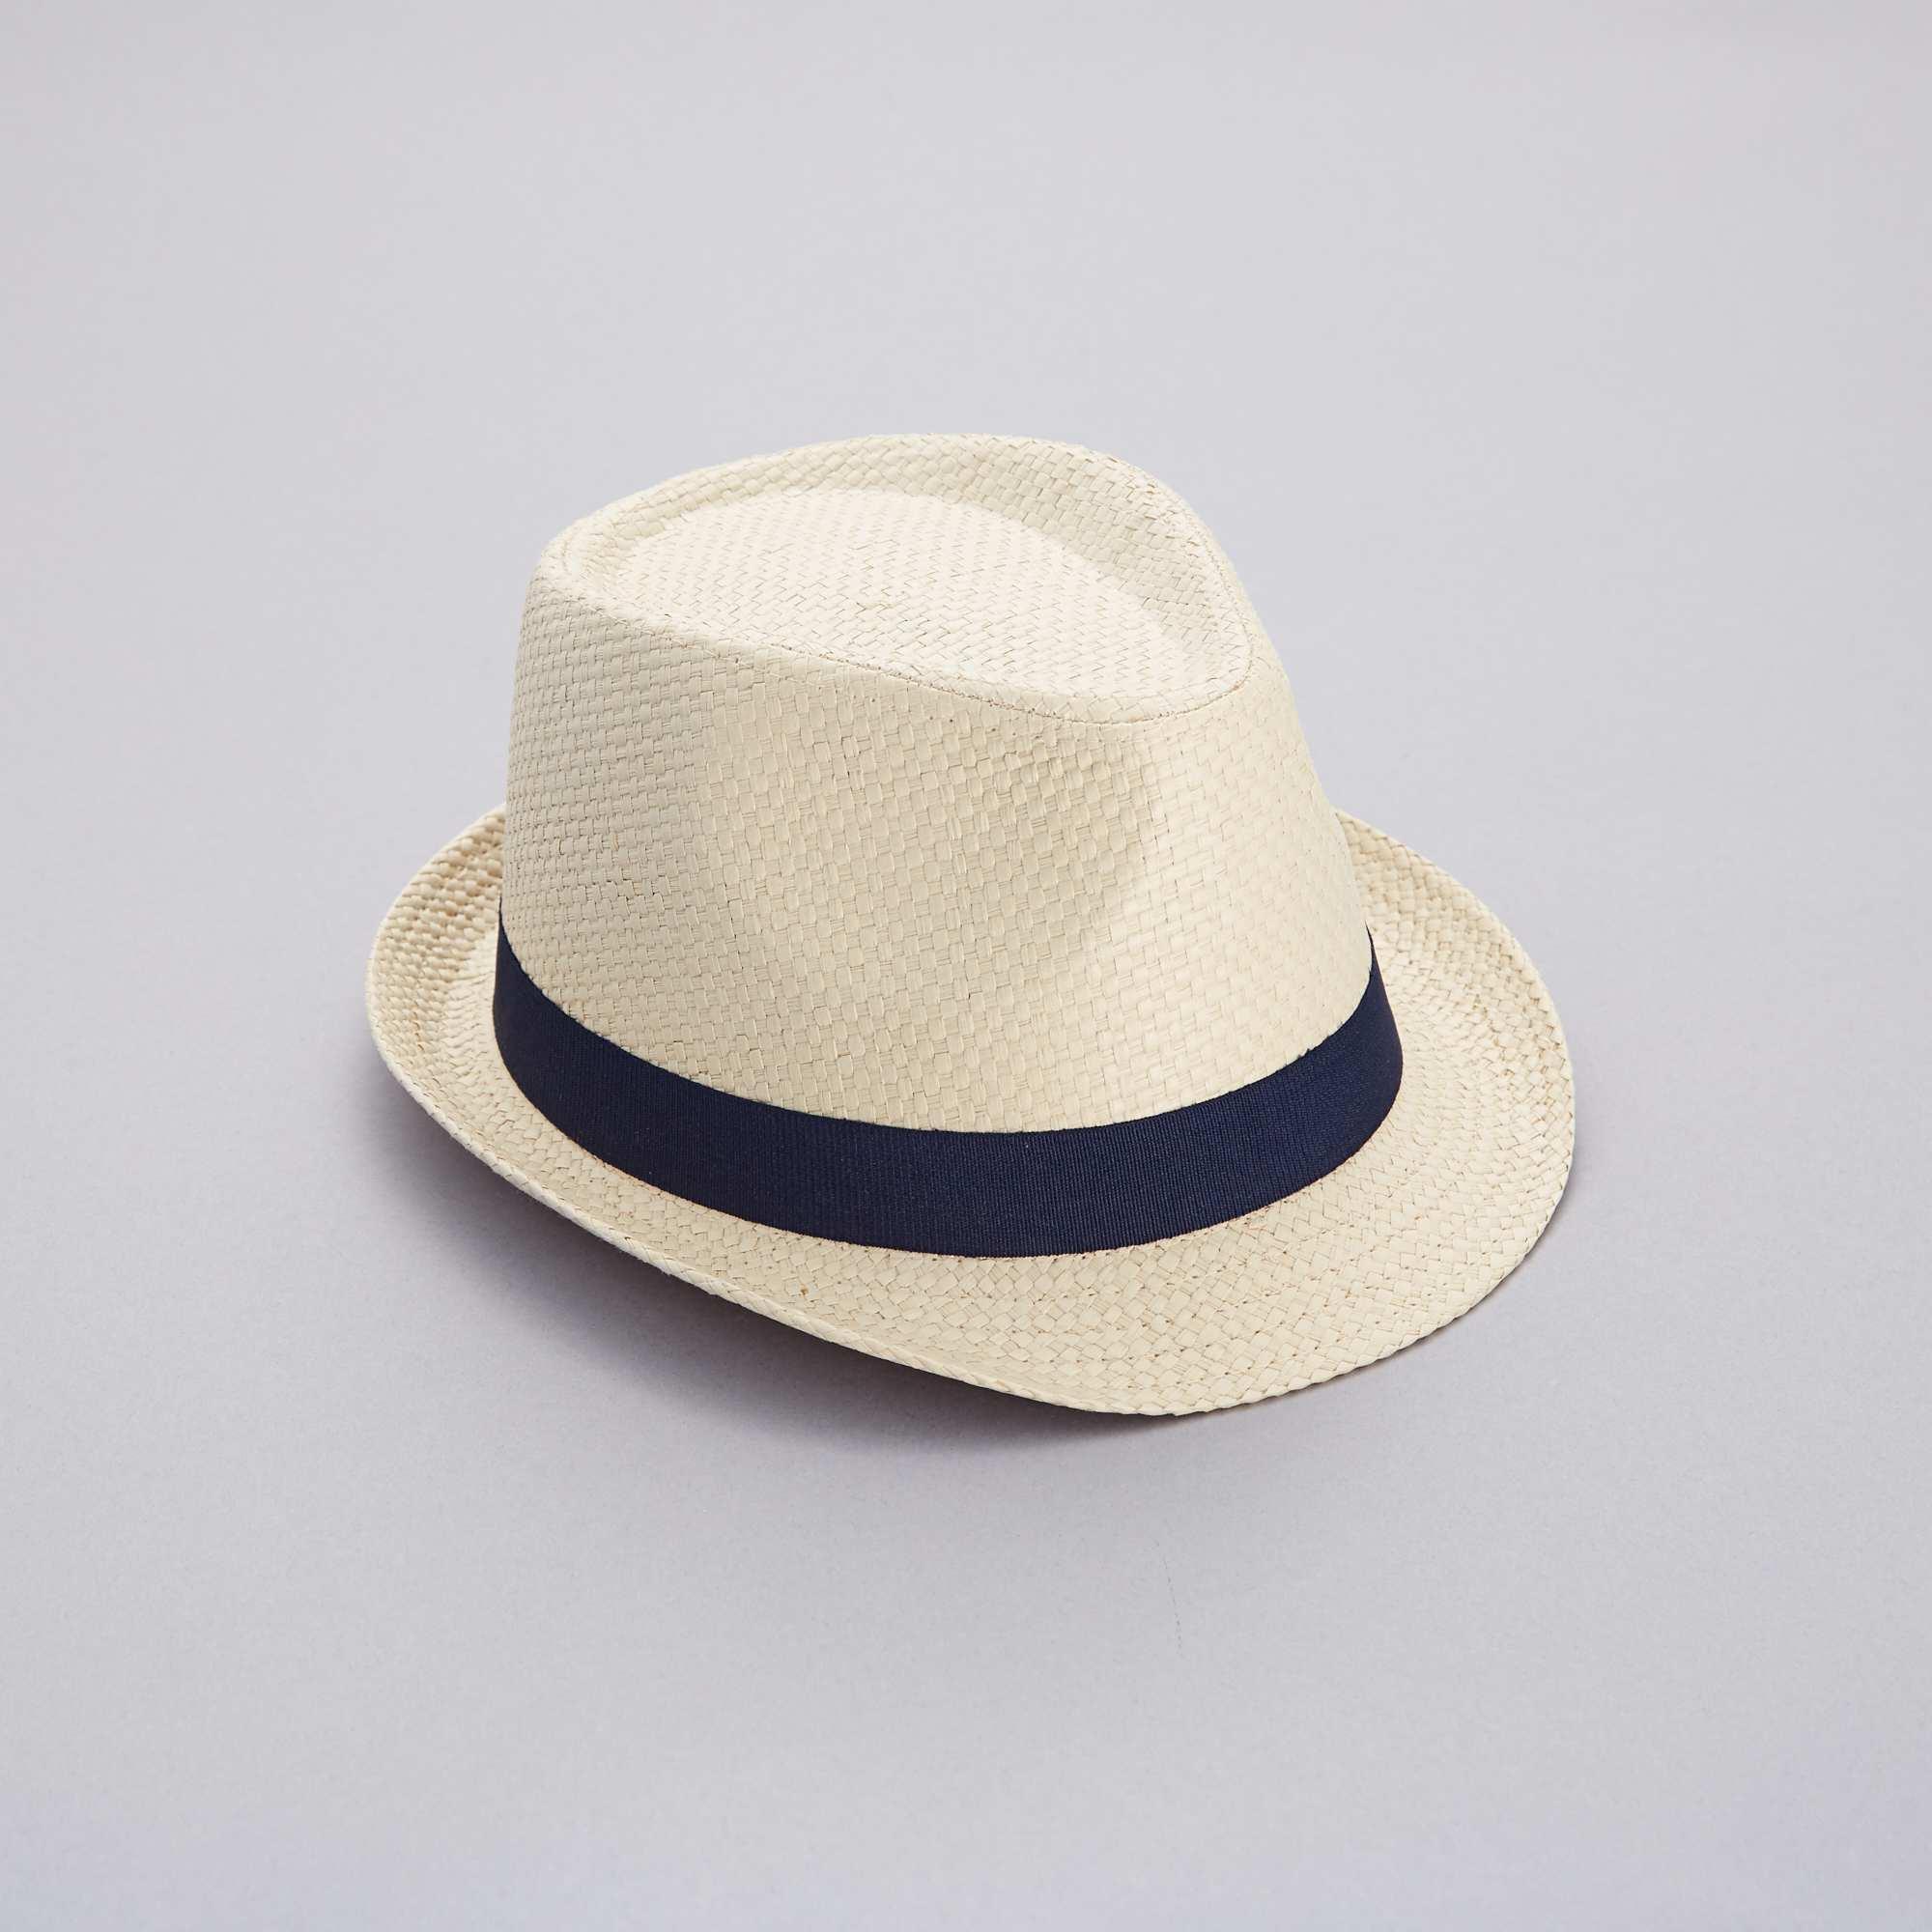 e6d3526588233 Sombrero borsalino de paja Hombre - BEIGE - Kiabi - 7